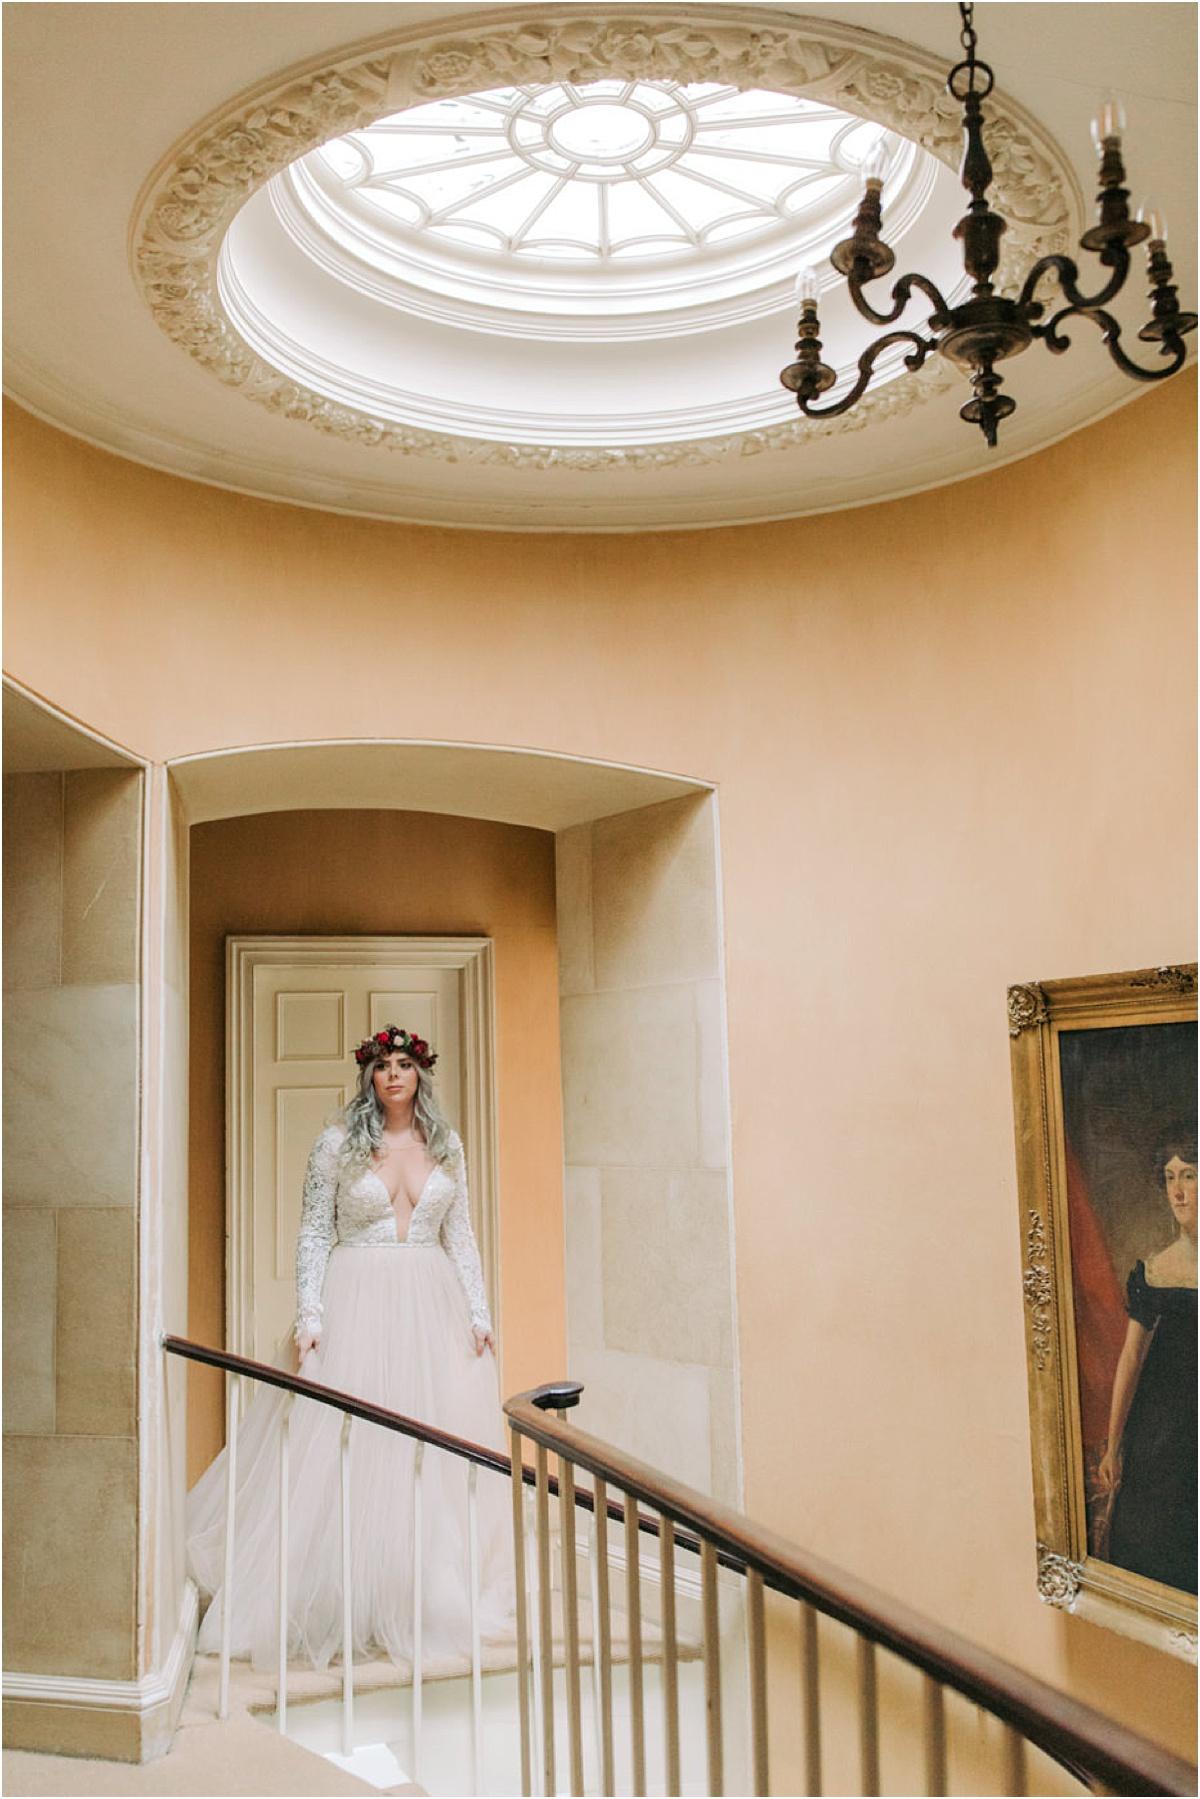 The Gibsons,alternative bride,elegant wedding photographers glasgow,elopement scotland,elopements,light and airy wedding photographers glasgow,natural wedding photographers,romantic photographers Scotland,